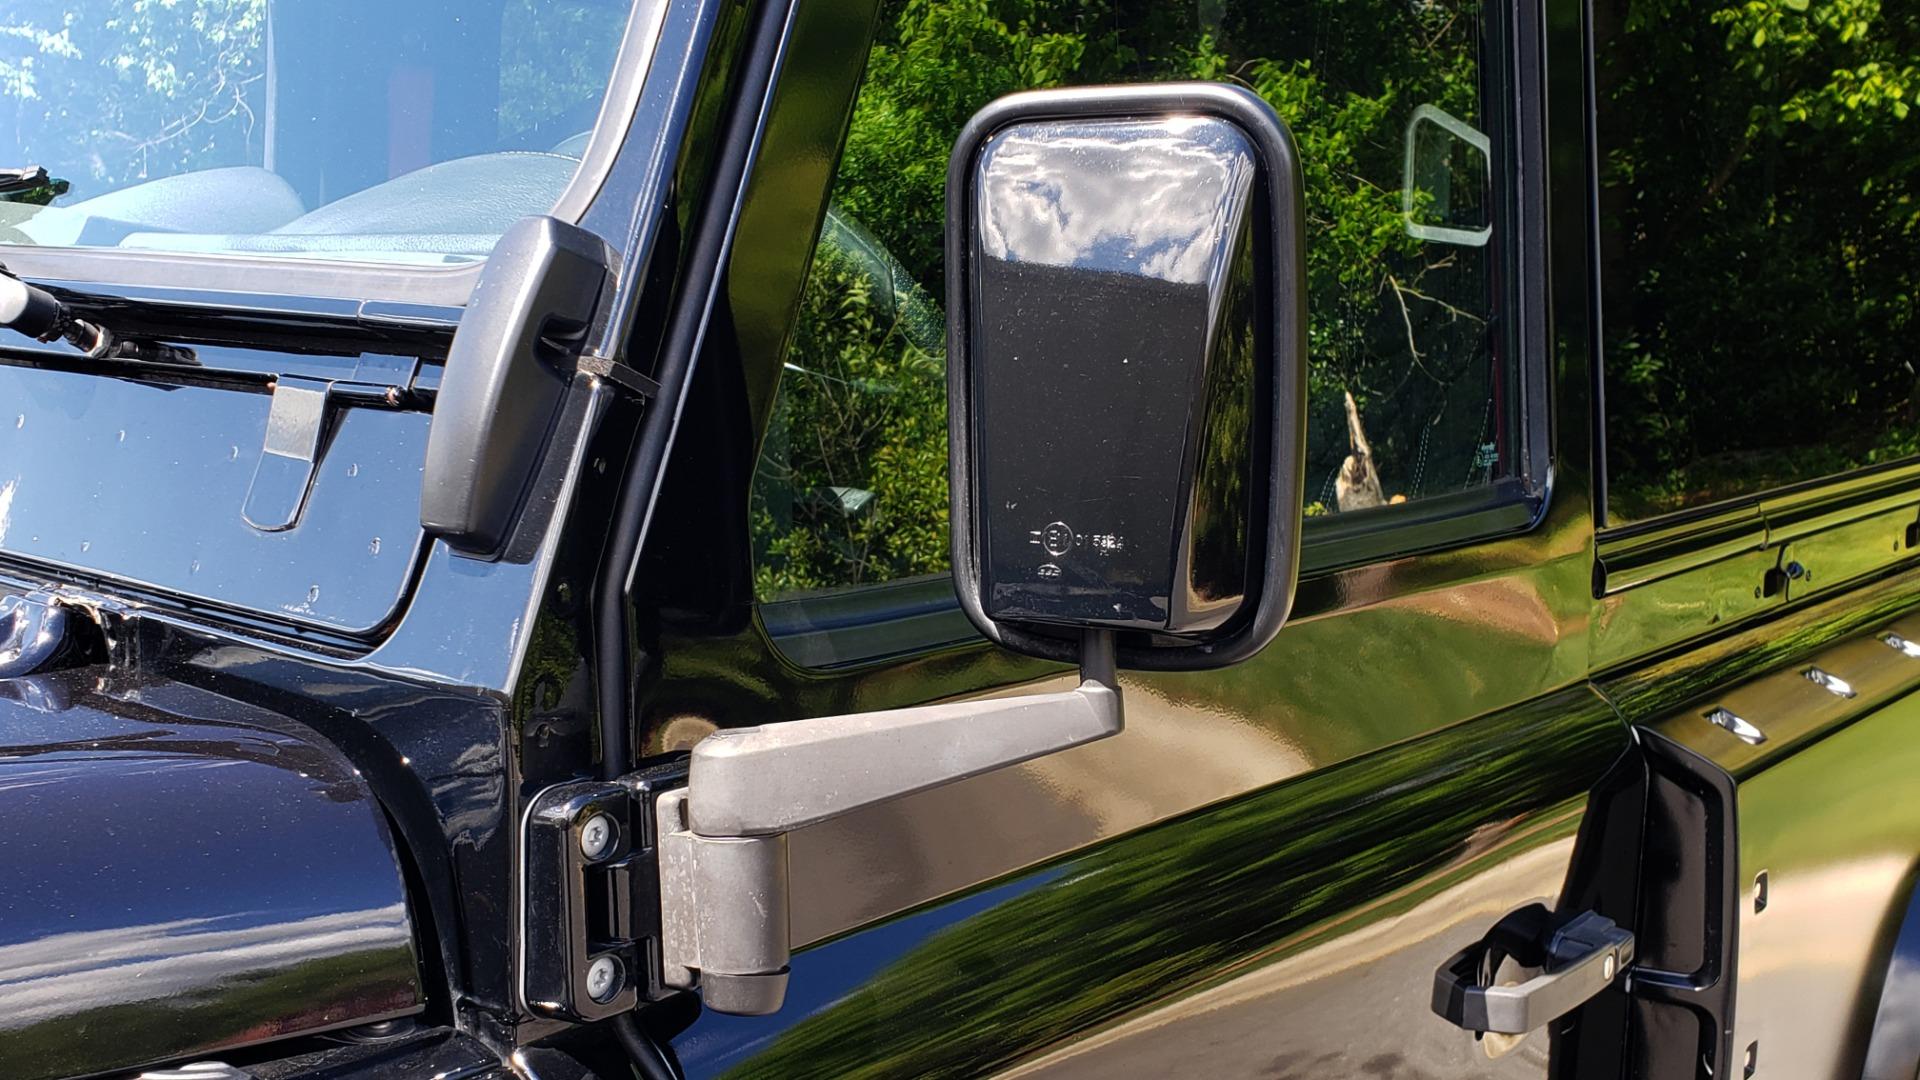 Used 1985 Land Rover DEFENDER 90 4X4 CUSTOM RESTORED 5.3L LS V8 for sale Sold at Formula Imports in Charlotte NC 28227 18